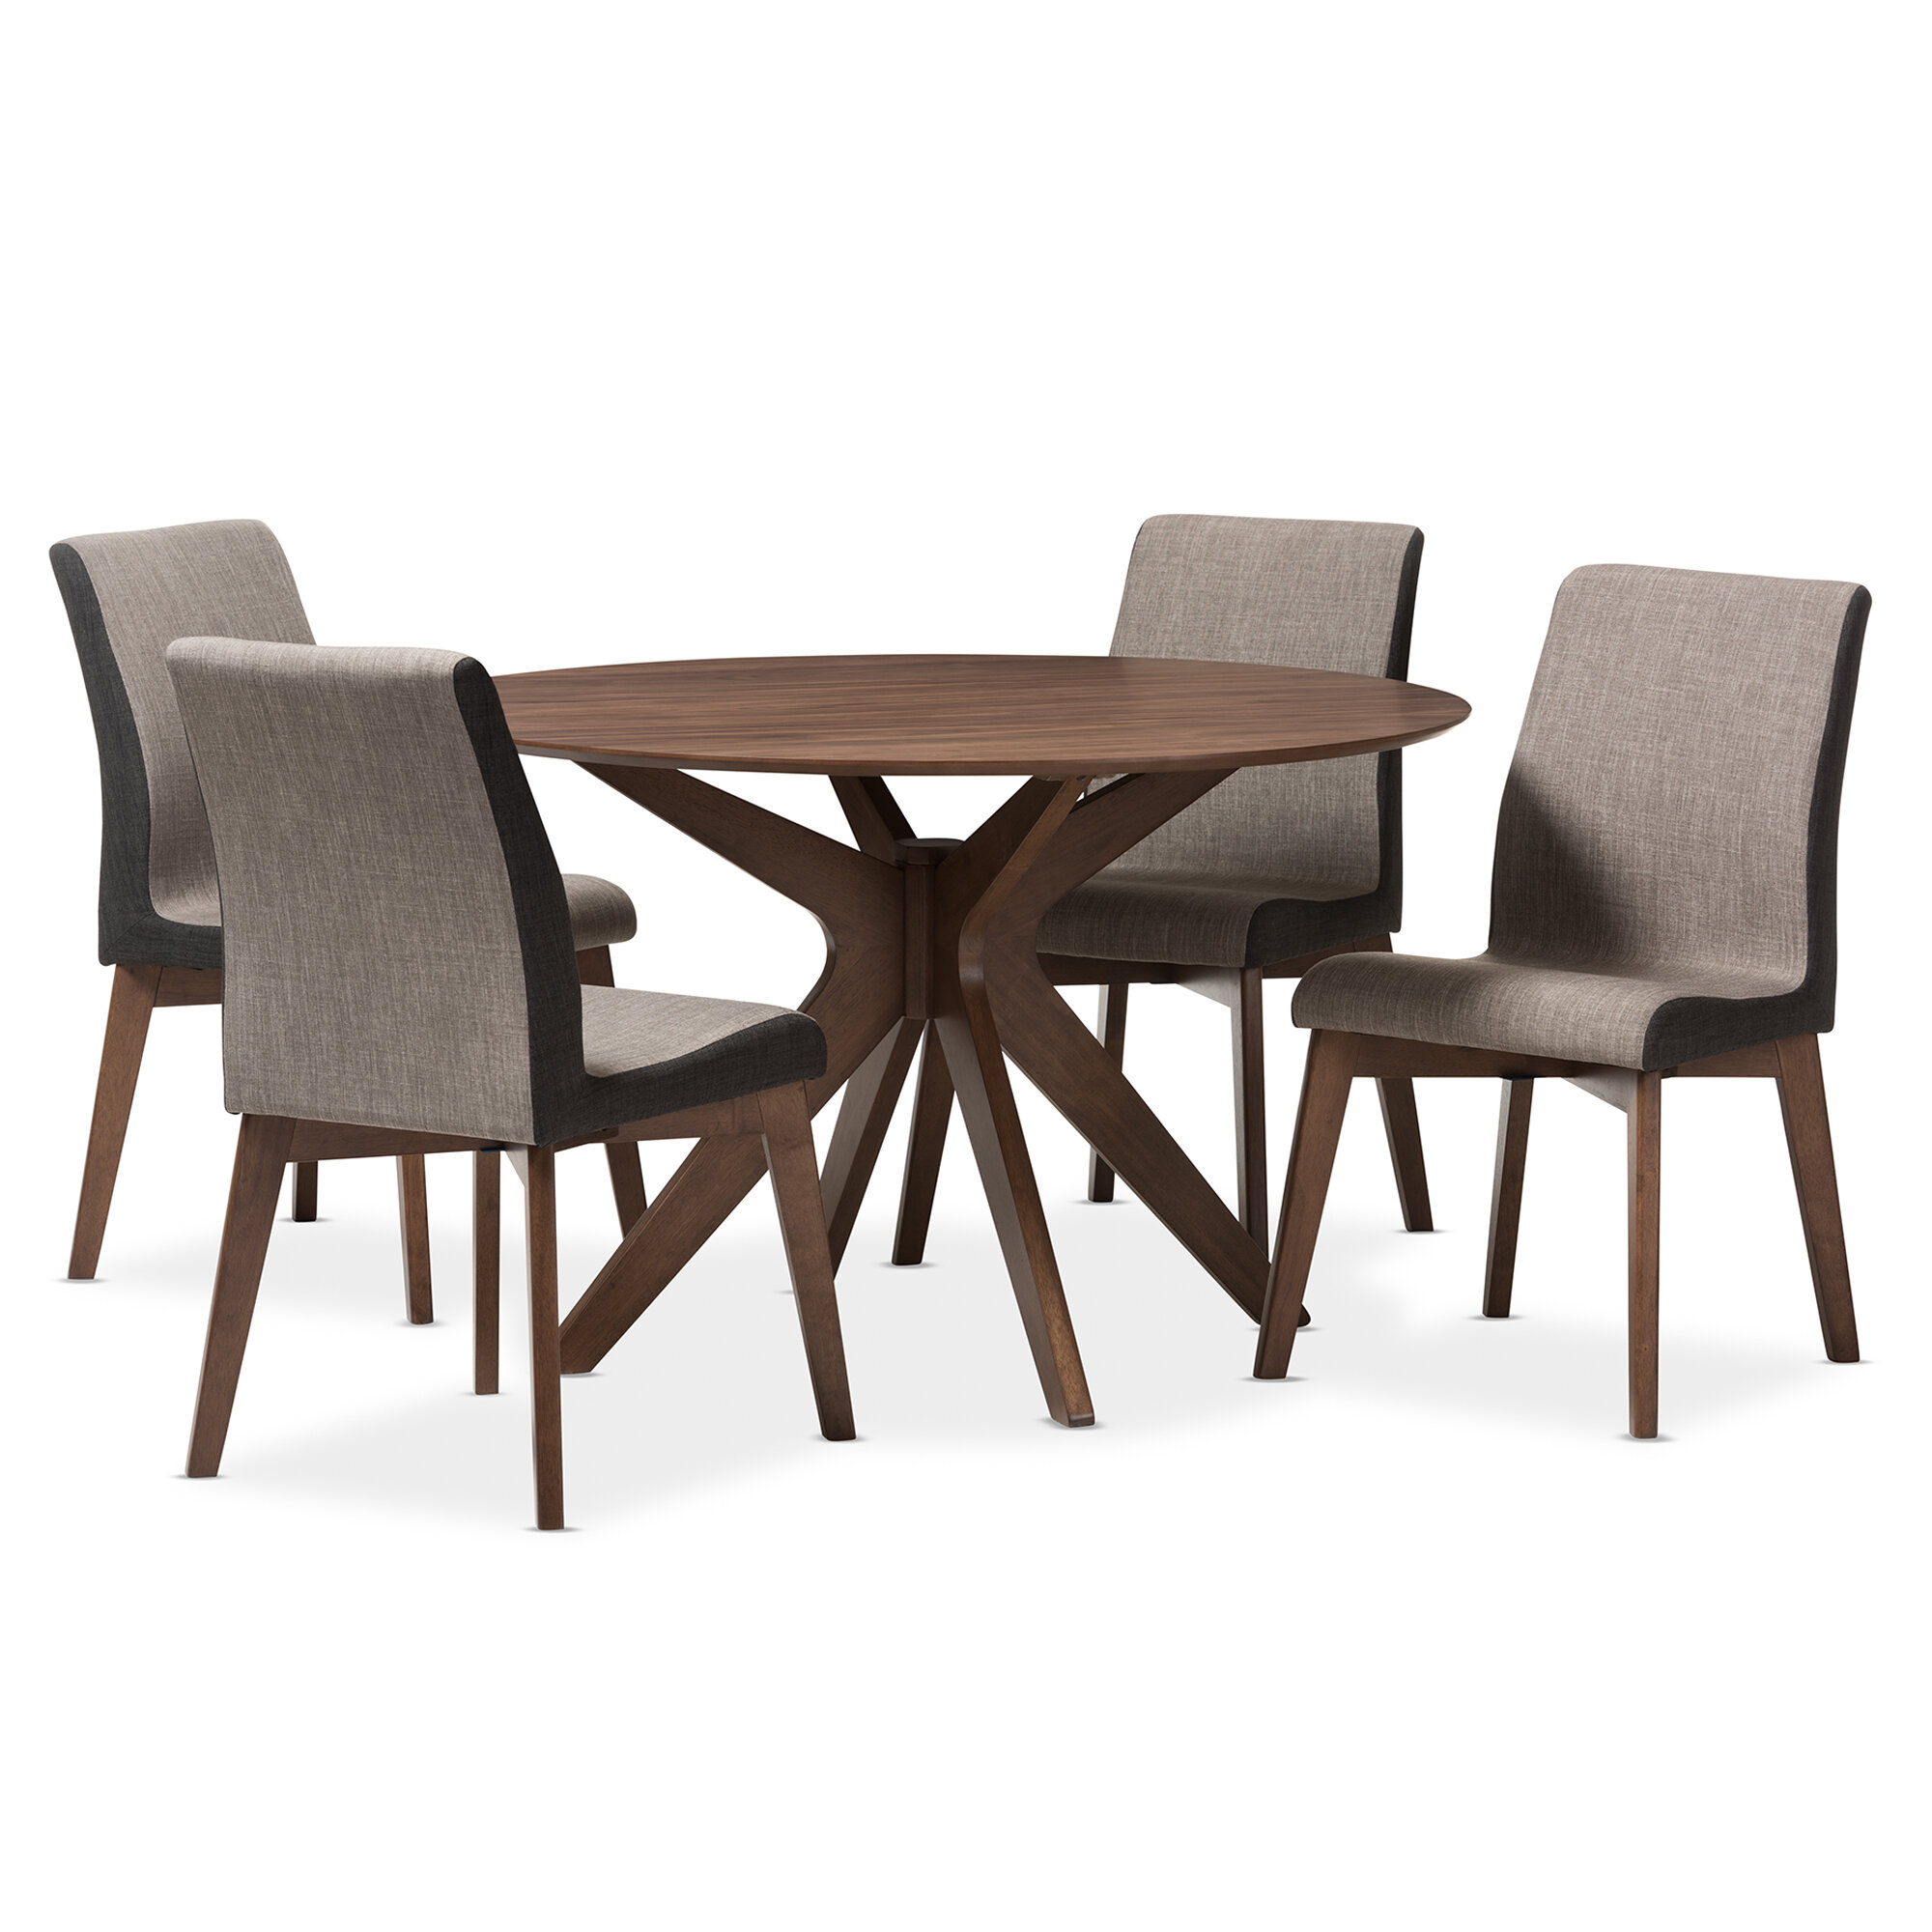 Whole Interiors Kimberly Mid Century Modern Wood Round 5 Piece Dining Set Reviews Wayfair